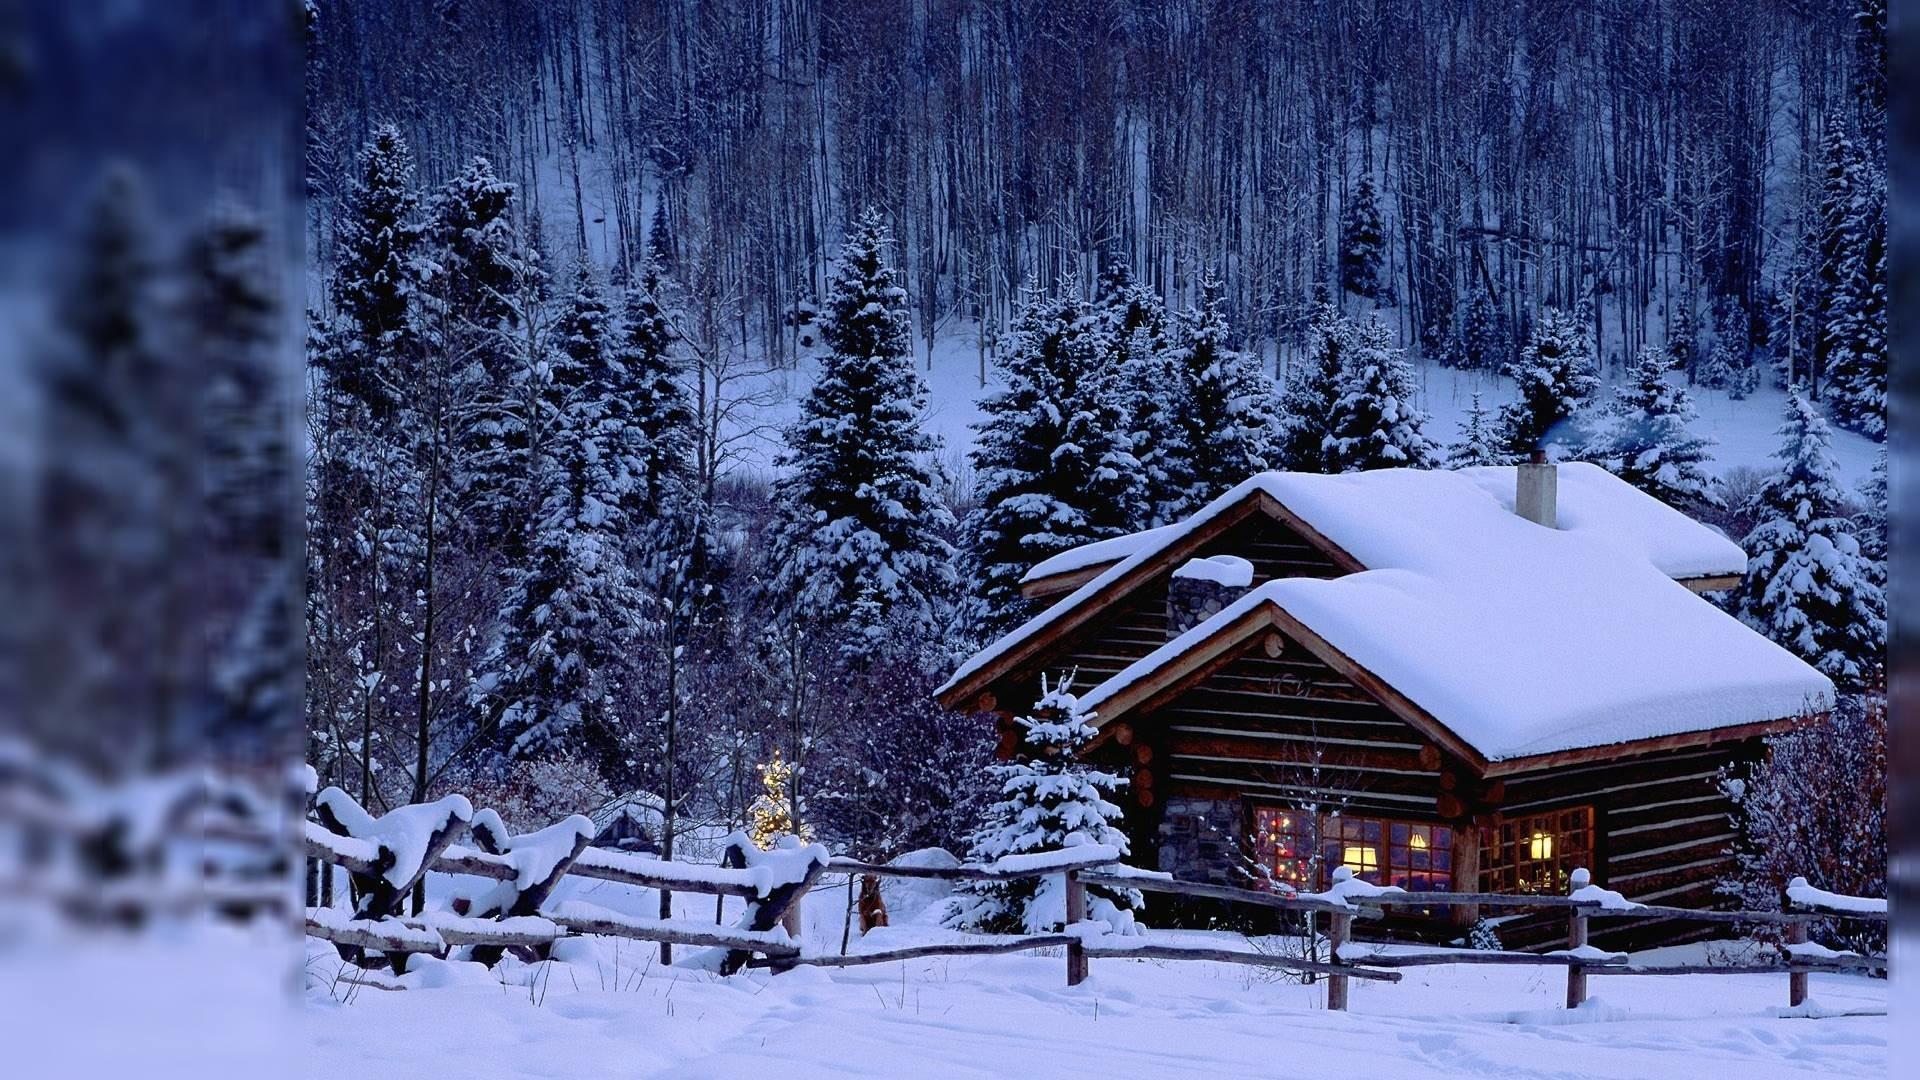 1920× 1080 Winter Backgrounds Wallpaper   Background Download